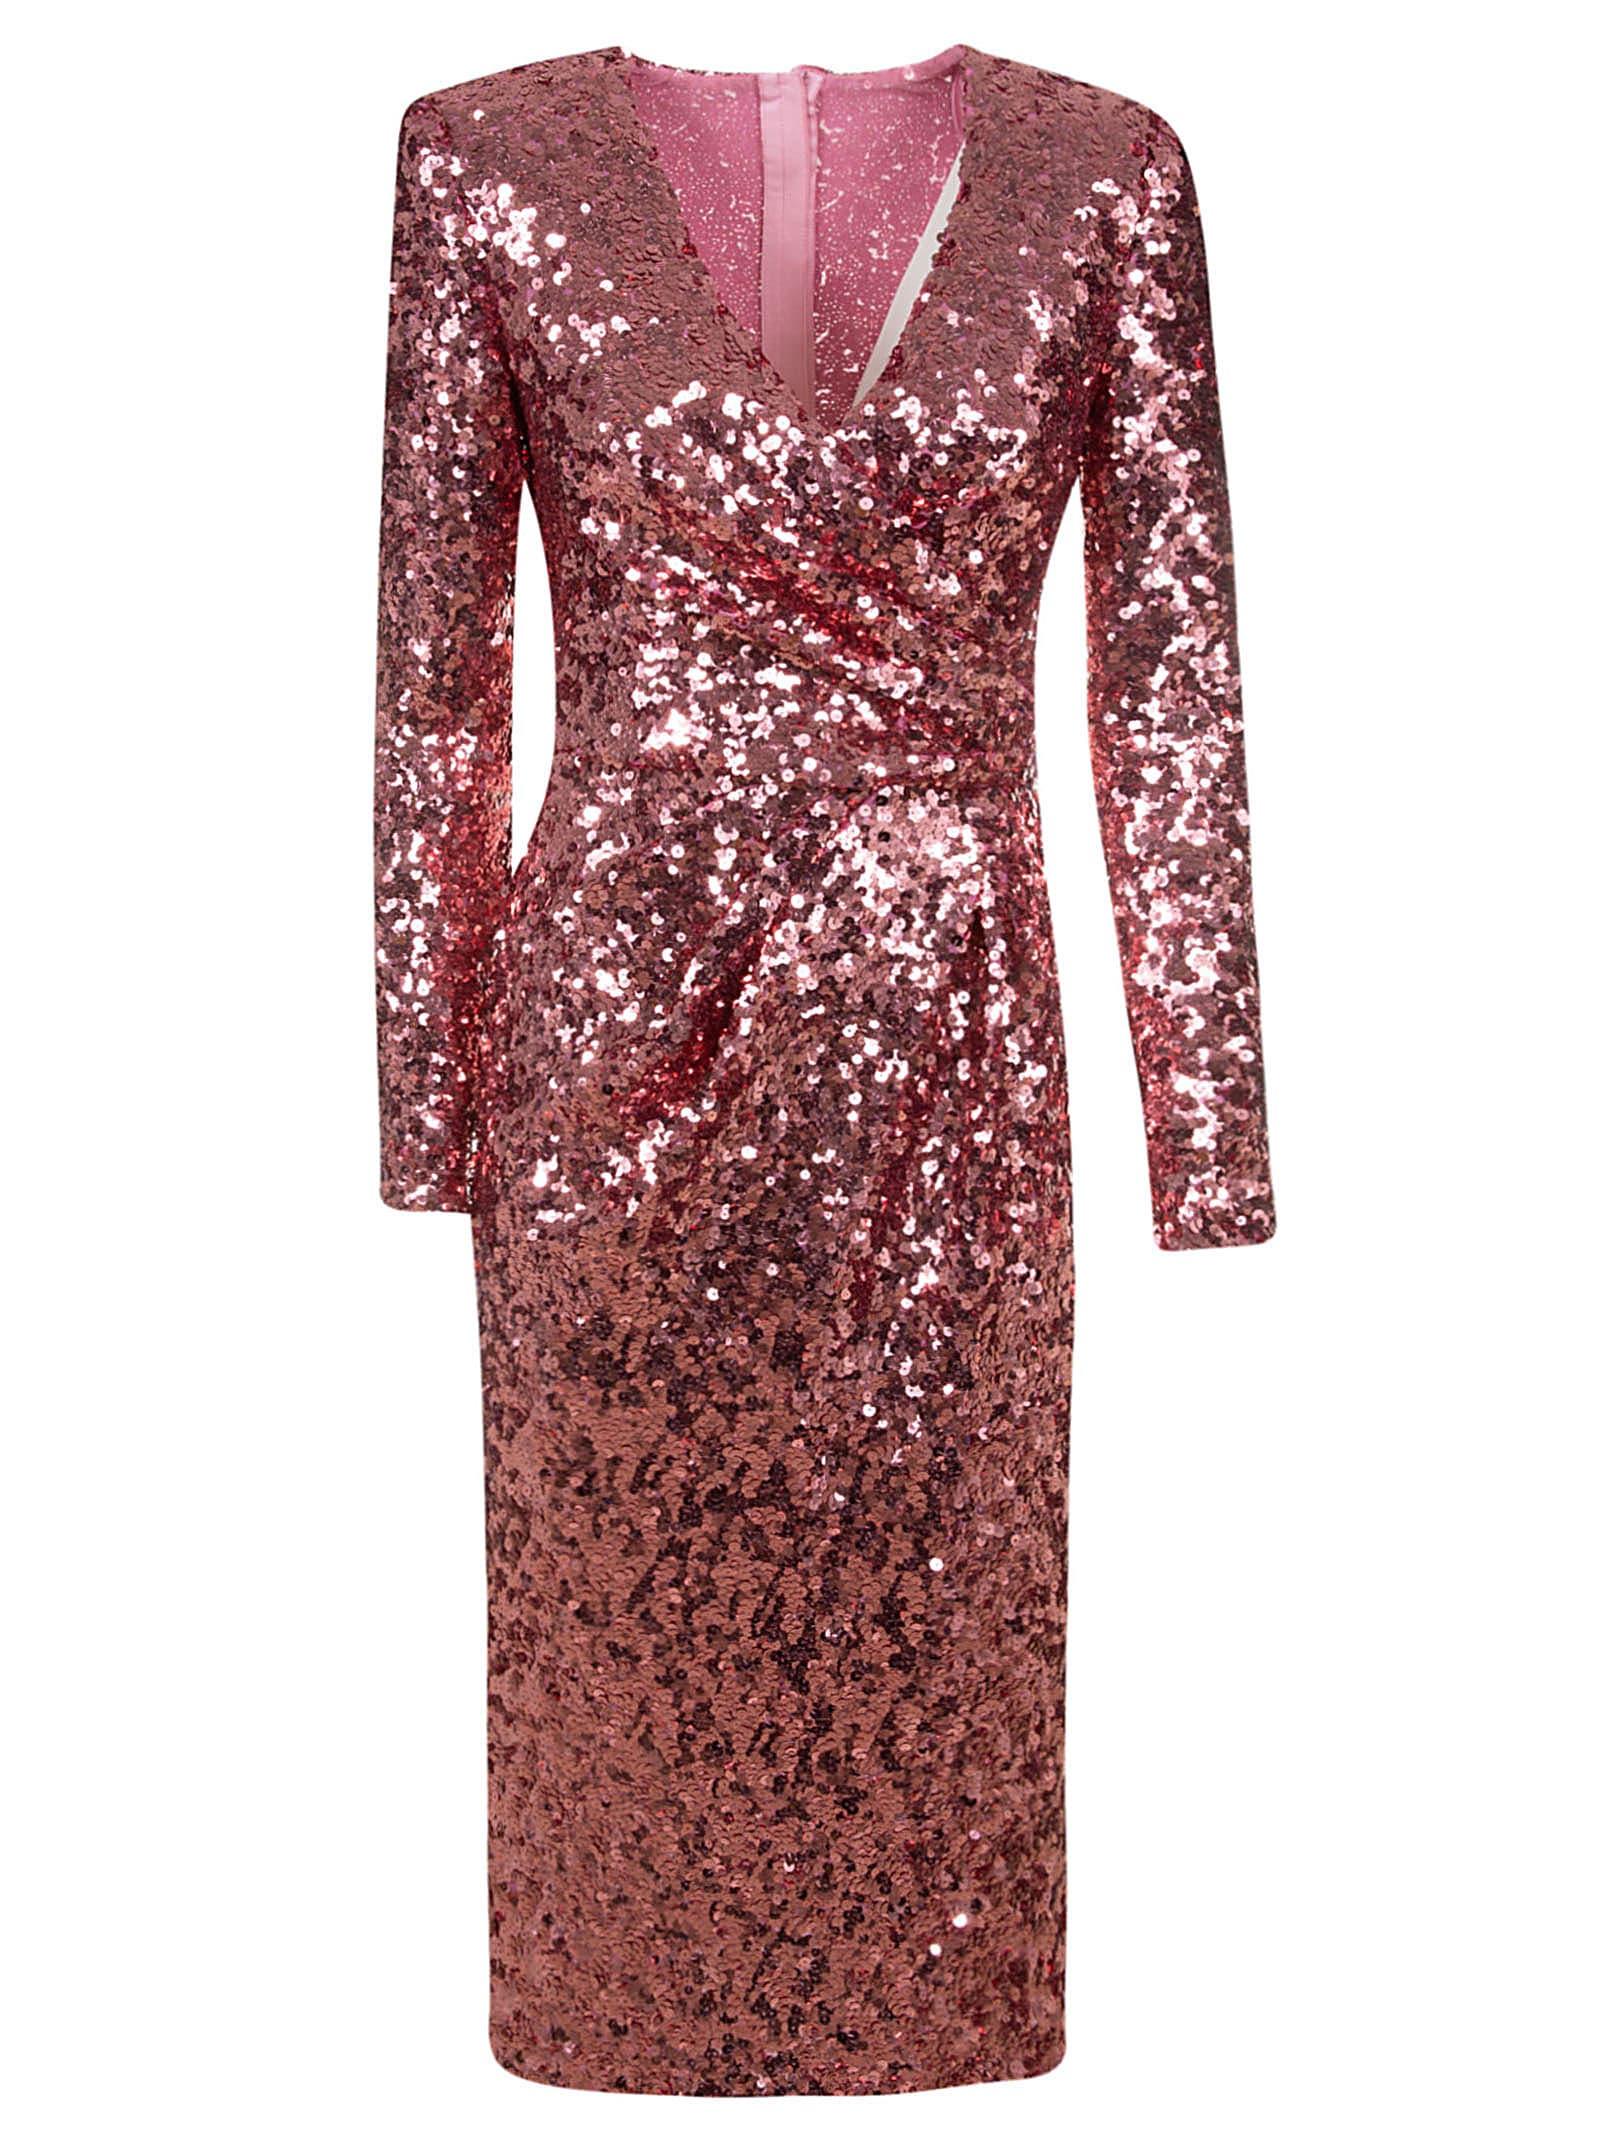 Buy Dolce & Gabbana Metallic Gathered Slim Dress online, shop Dolce & Gabbana with free shipping